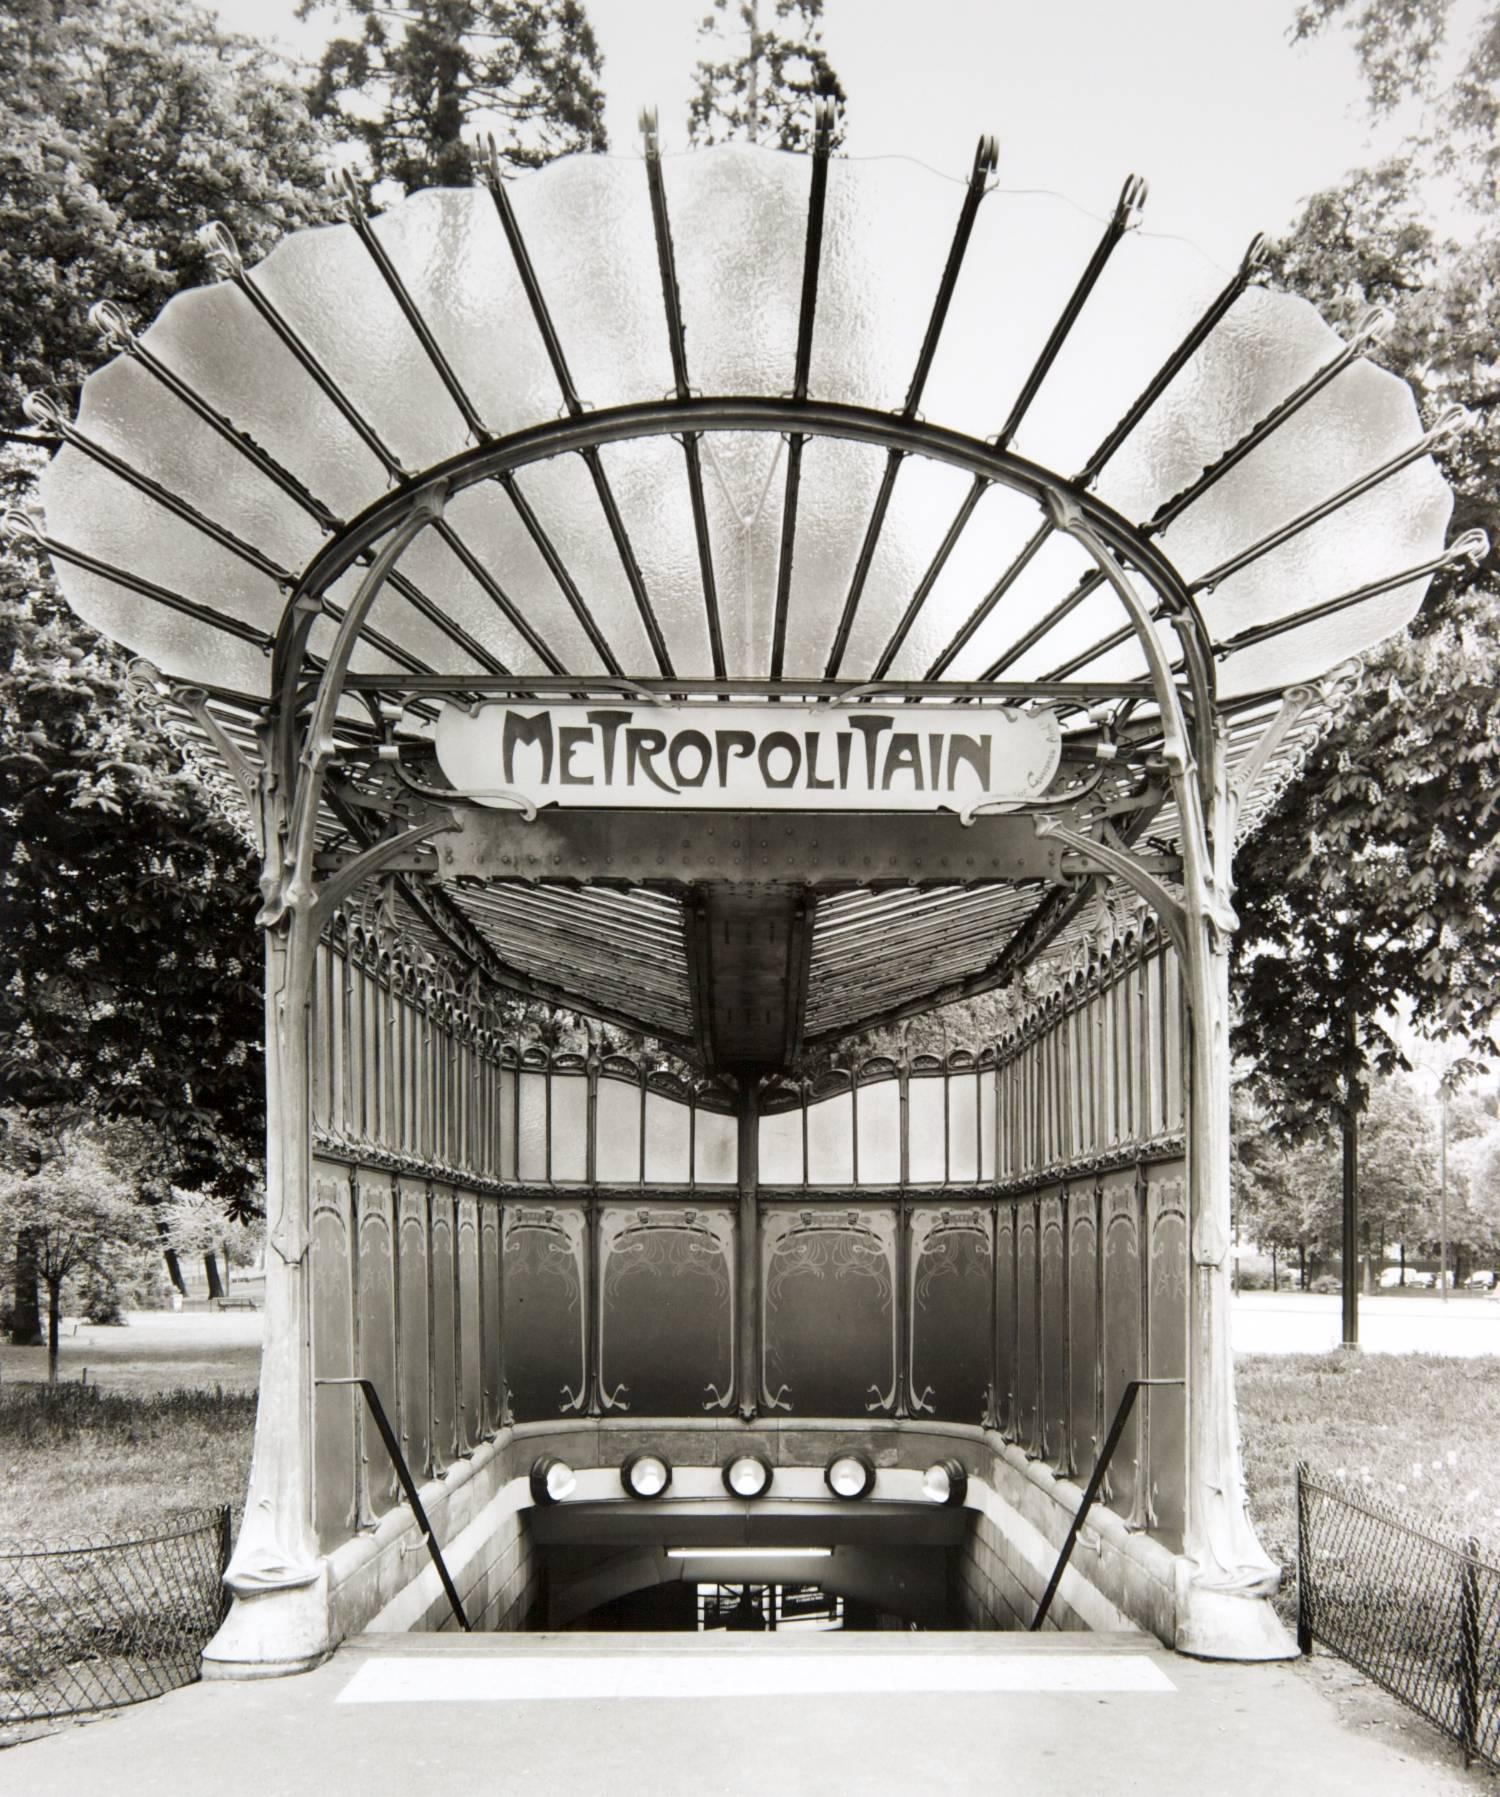 Metropolitain (Paris)